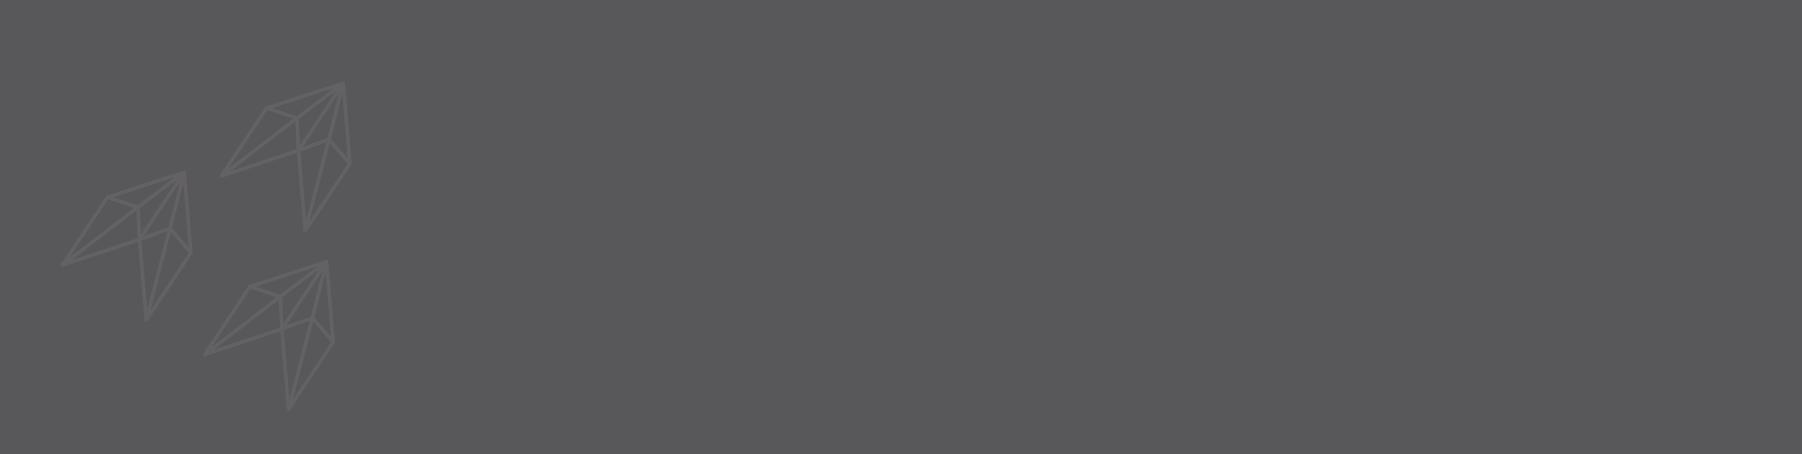 Copilot-mid-banner-small-dark.png